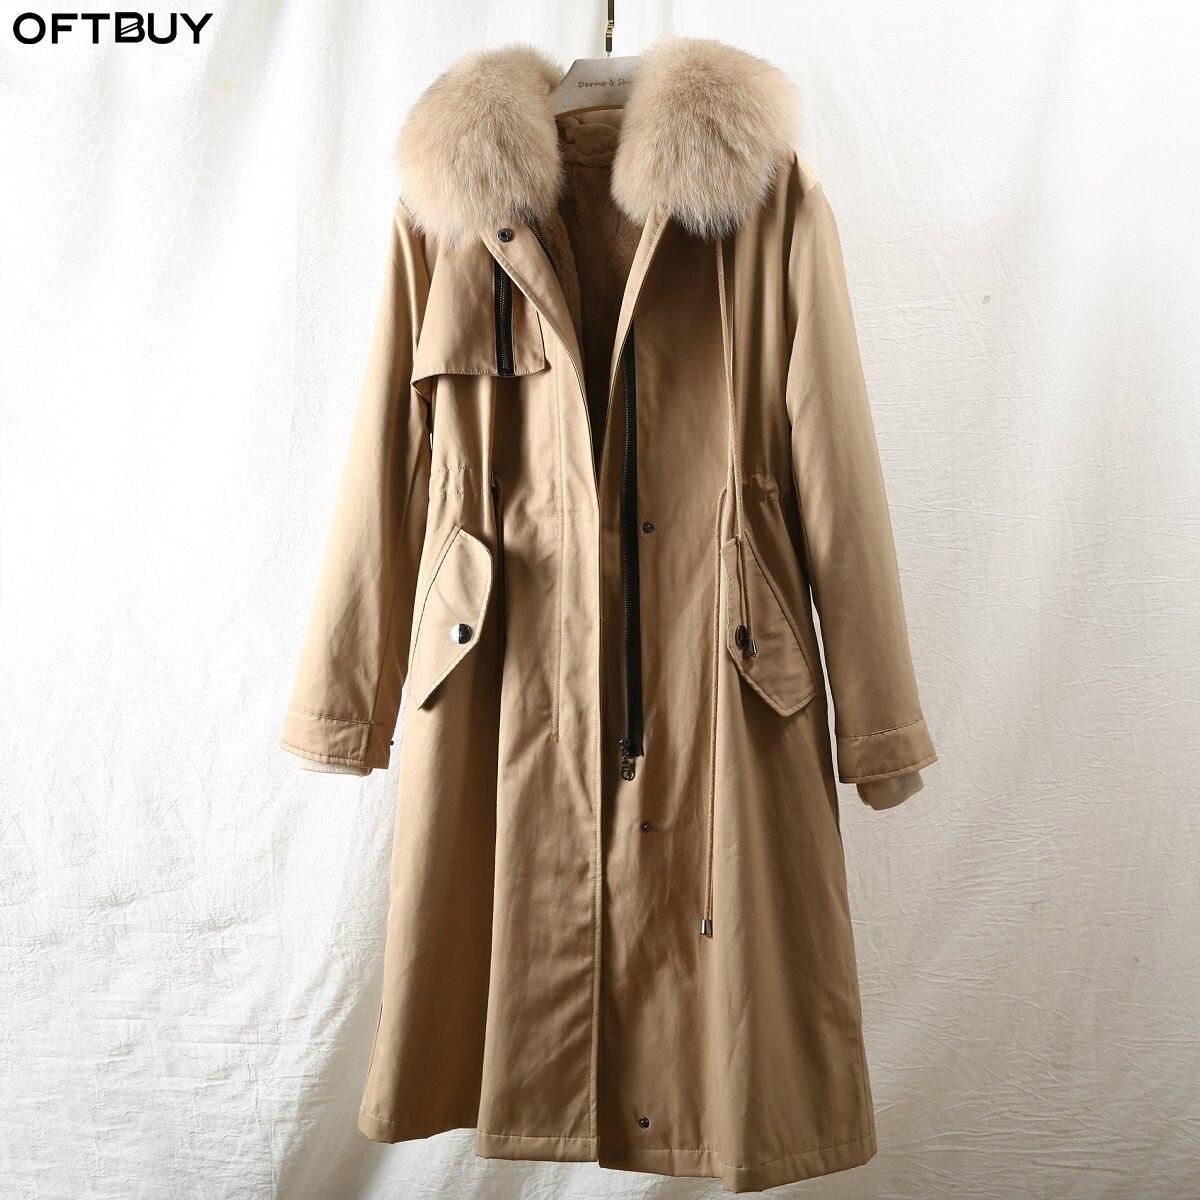 OFTBUY 2019 Real Fox Fur Collar Hood Coat Long Parkas Winter Jacket Women Natural Rabbit Fur Lining Detachable Outerwear Luxury